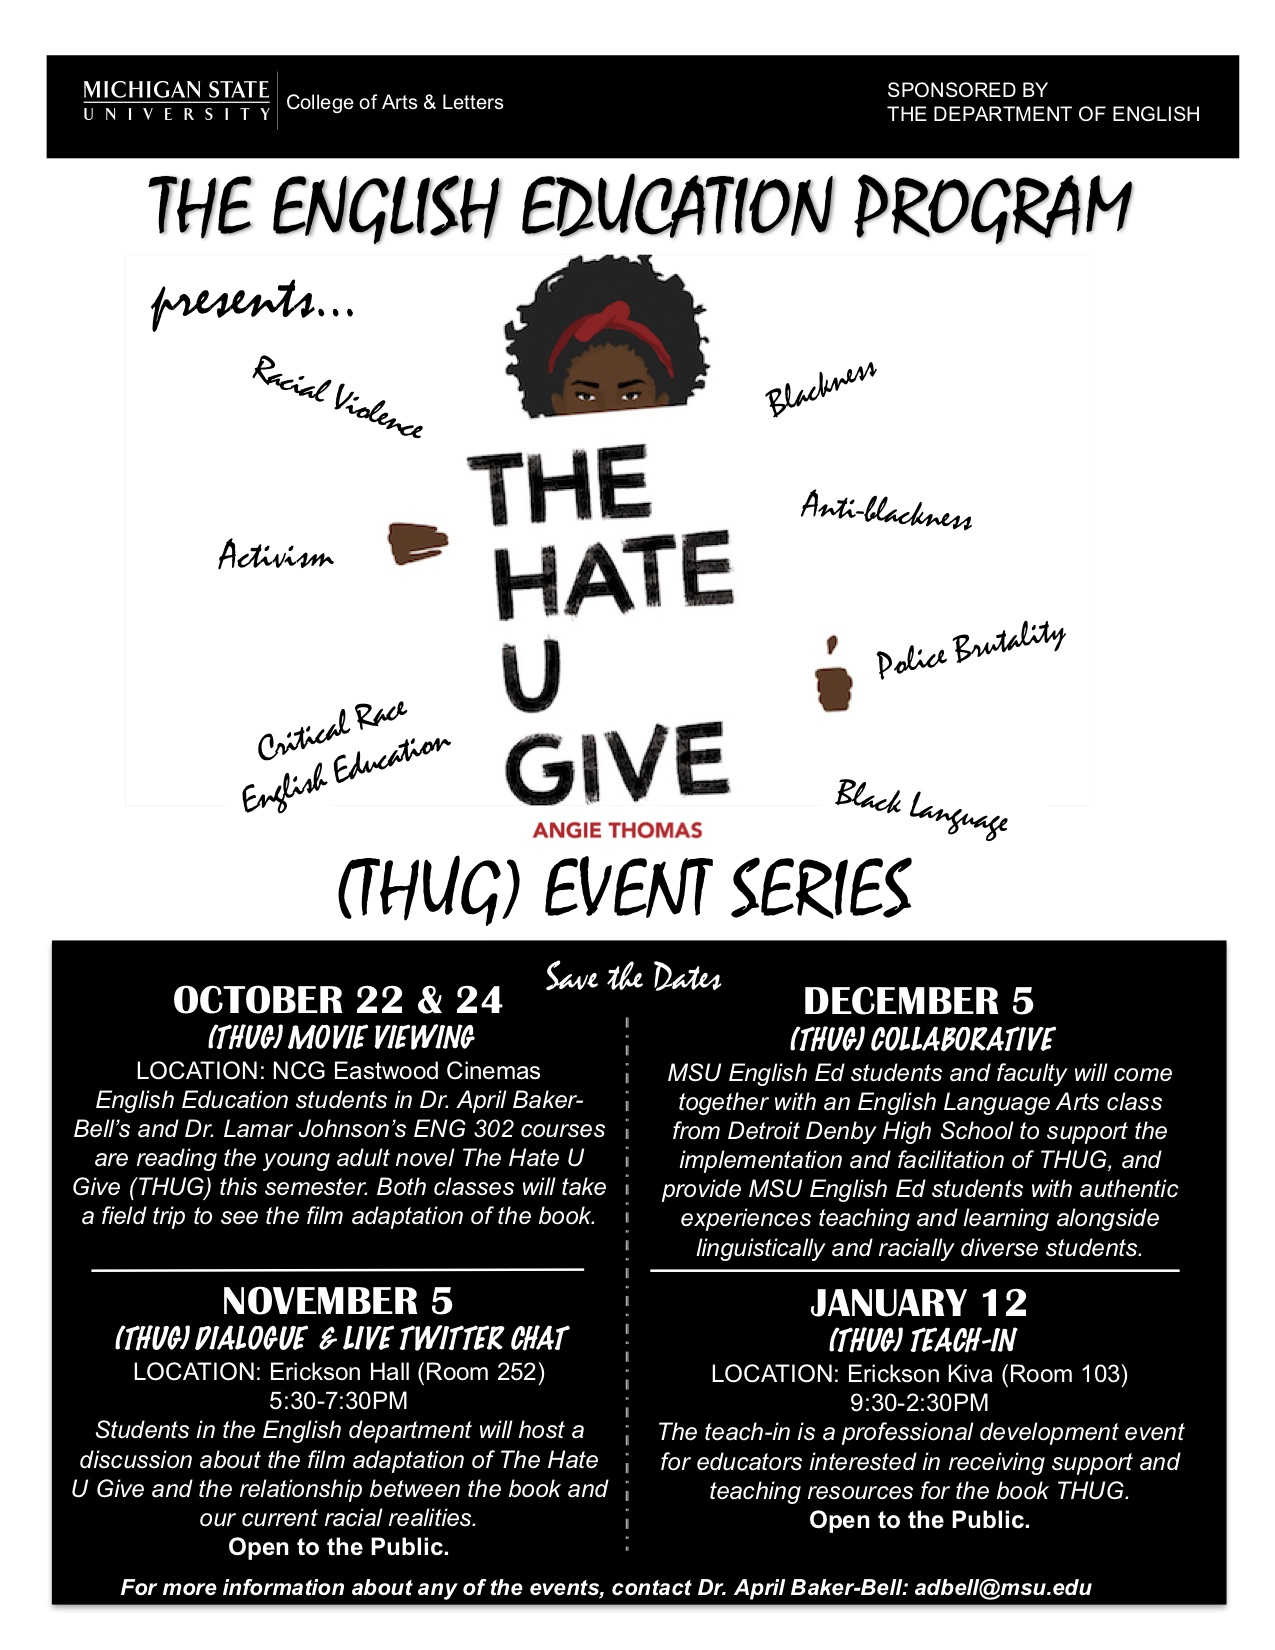 The English Education Program (THUG) Collaborative